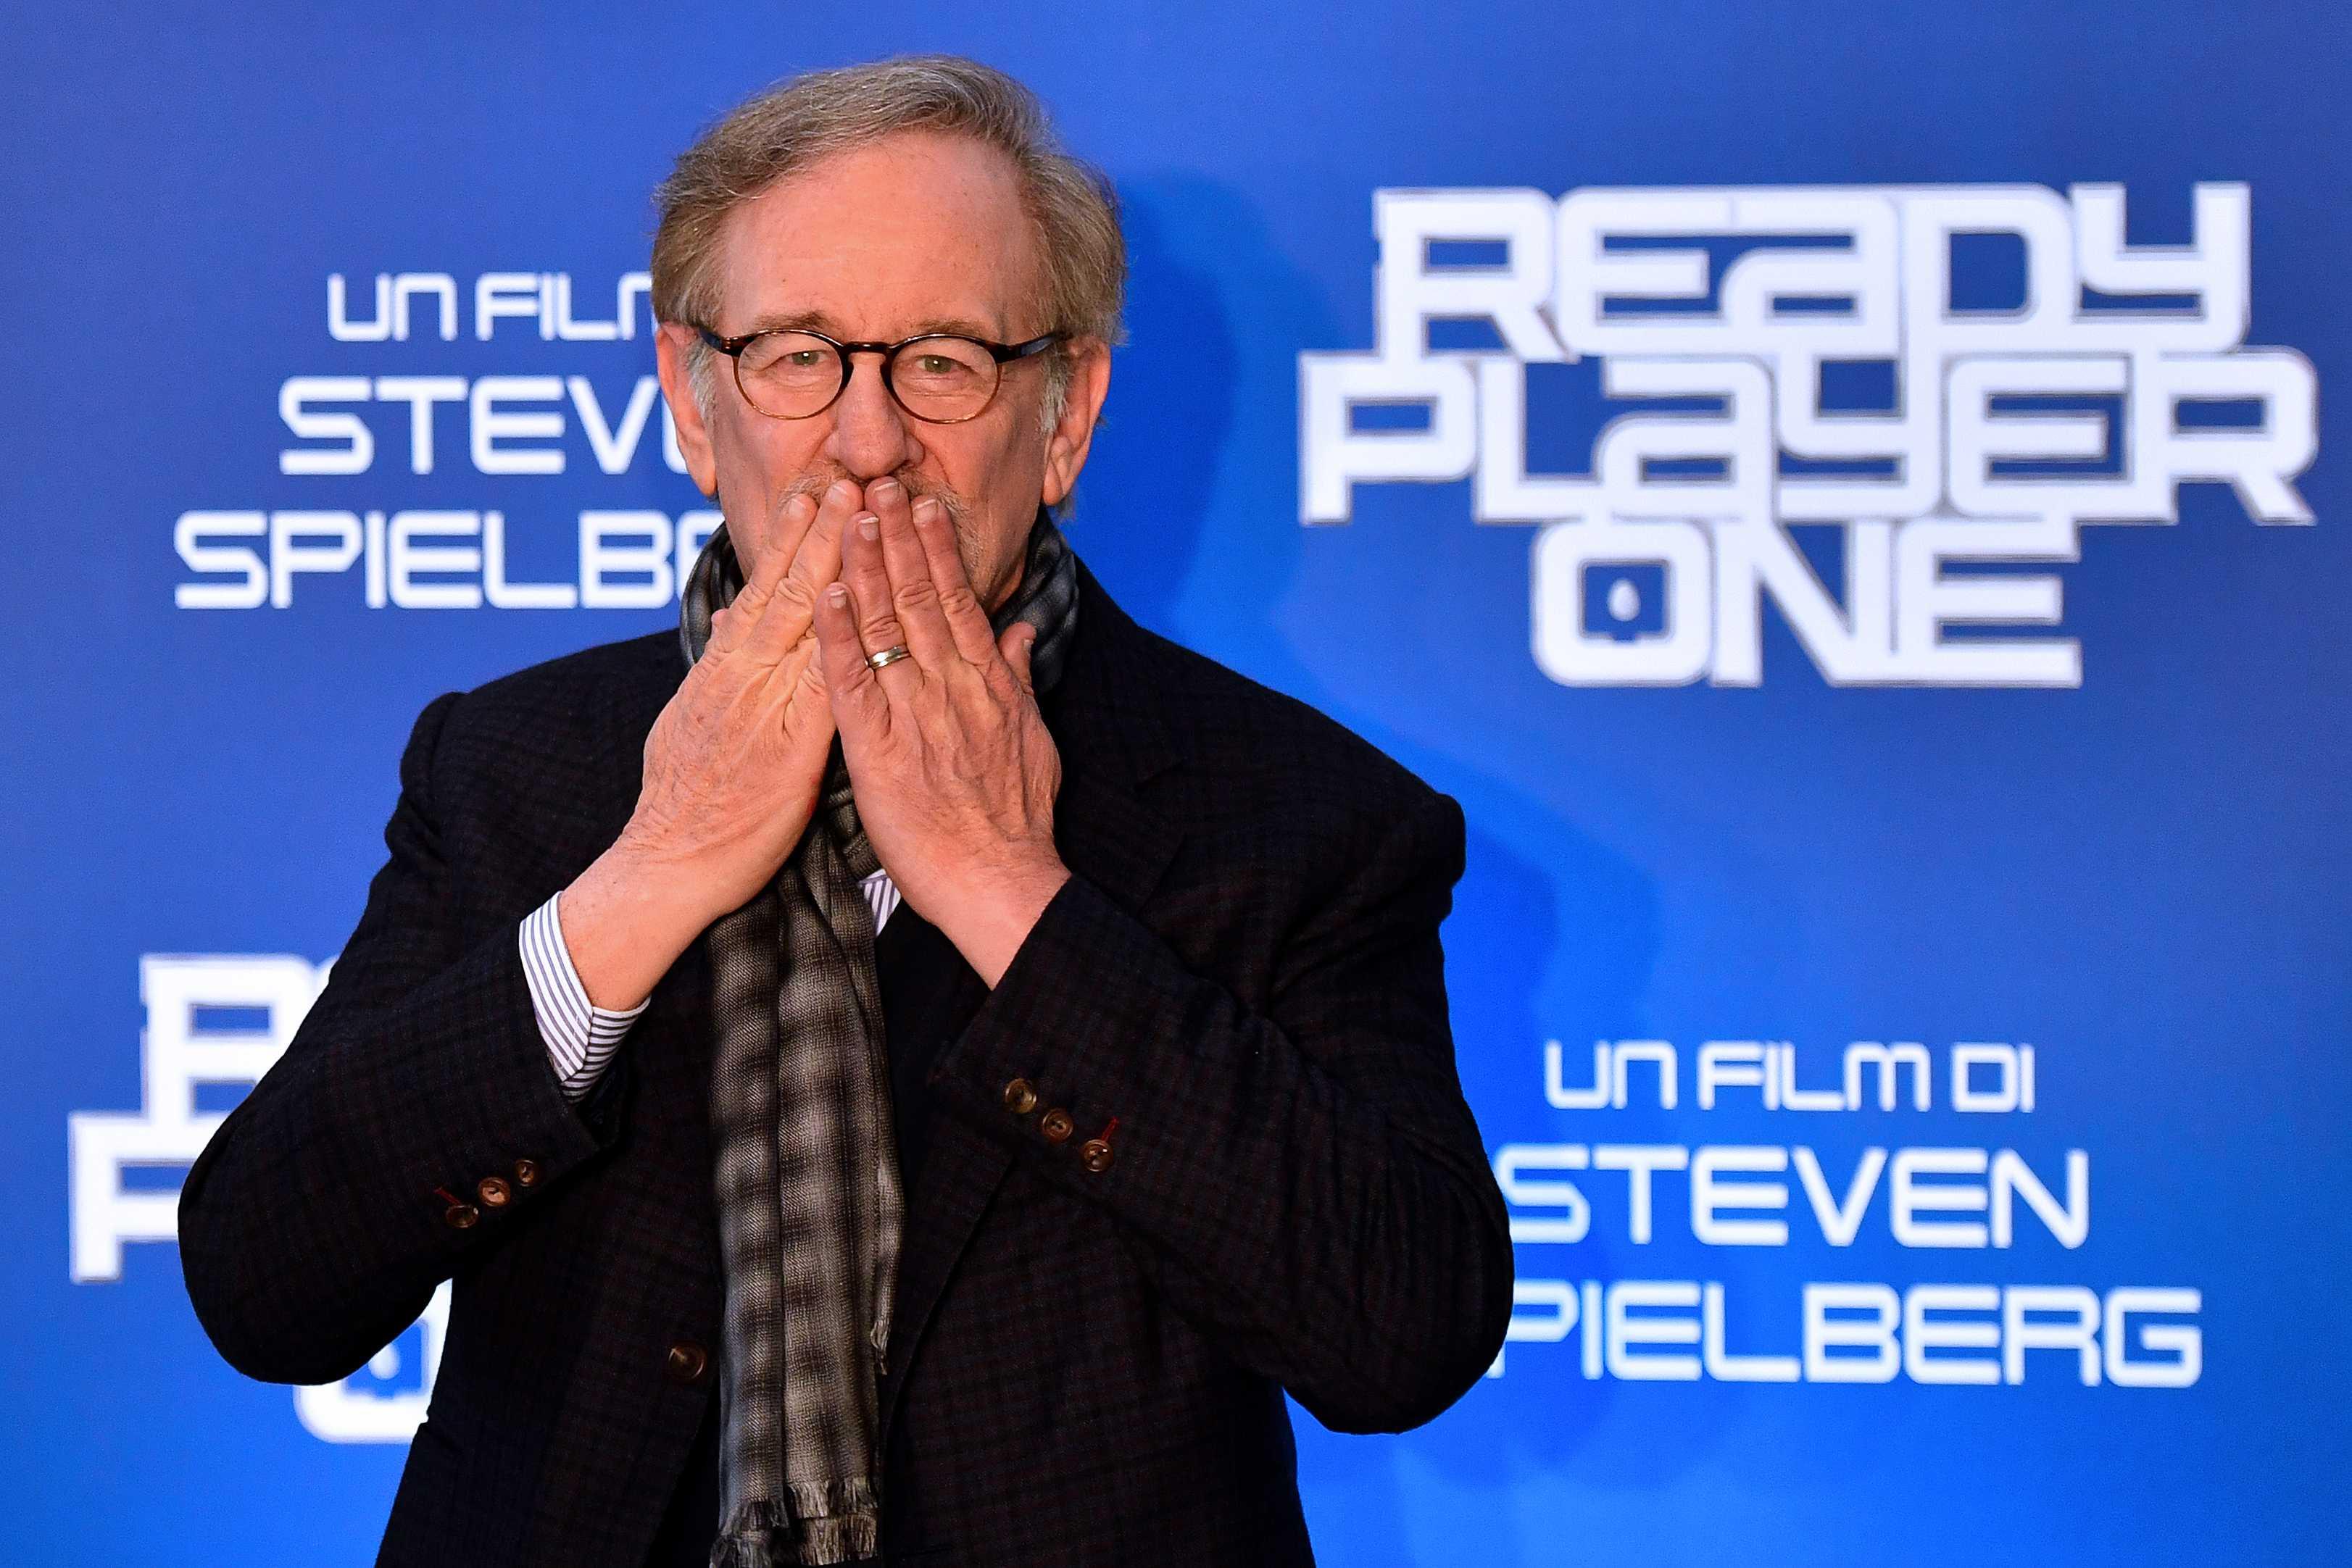 Steven Spielberg logra el récord de US$ 10.000 millones en taquilla mundial